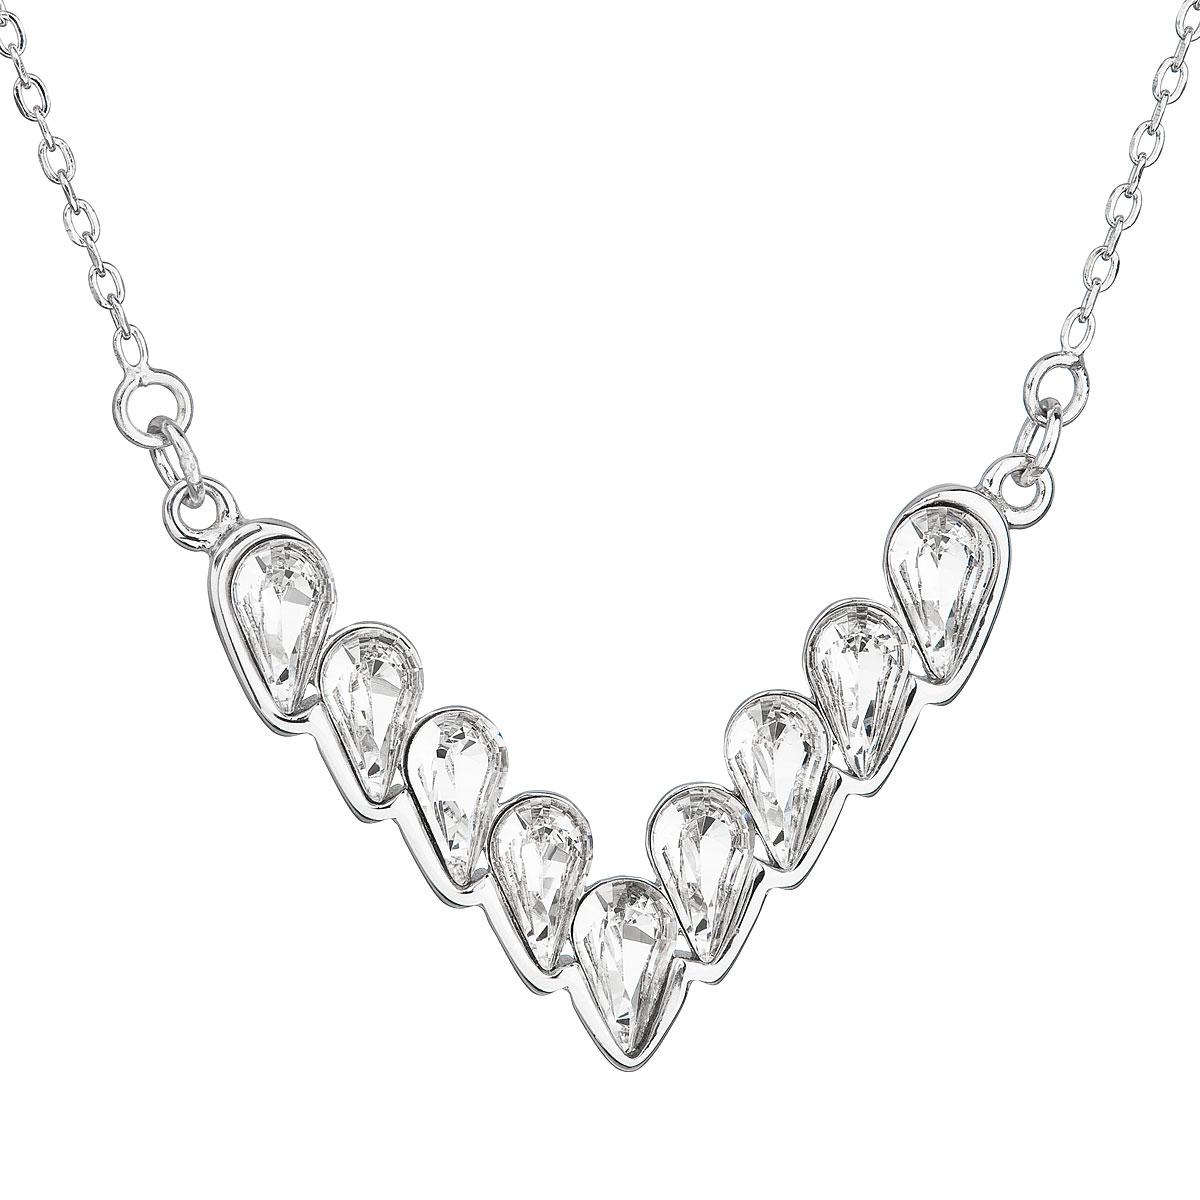 Evolution Group Stříbrný náhrdelník s krystaly Swarovski bílý 32067.1